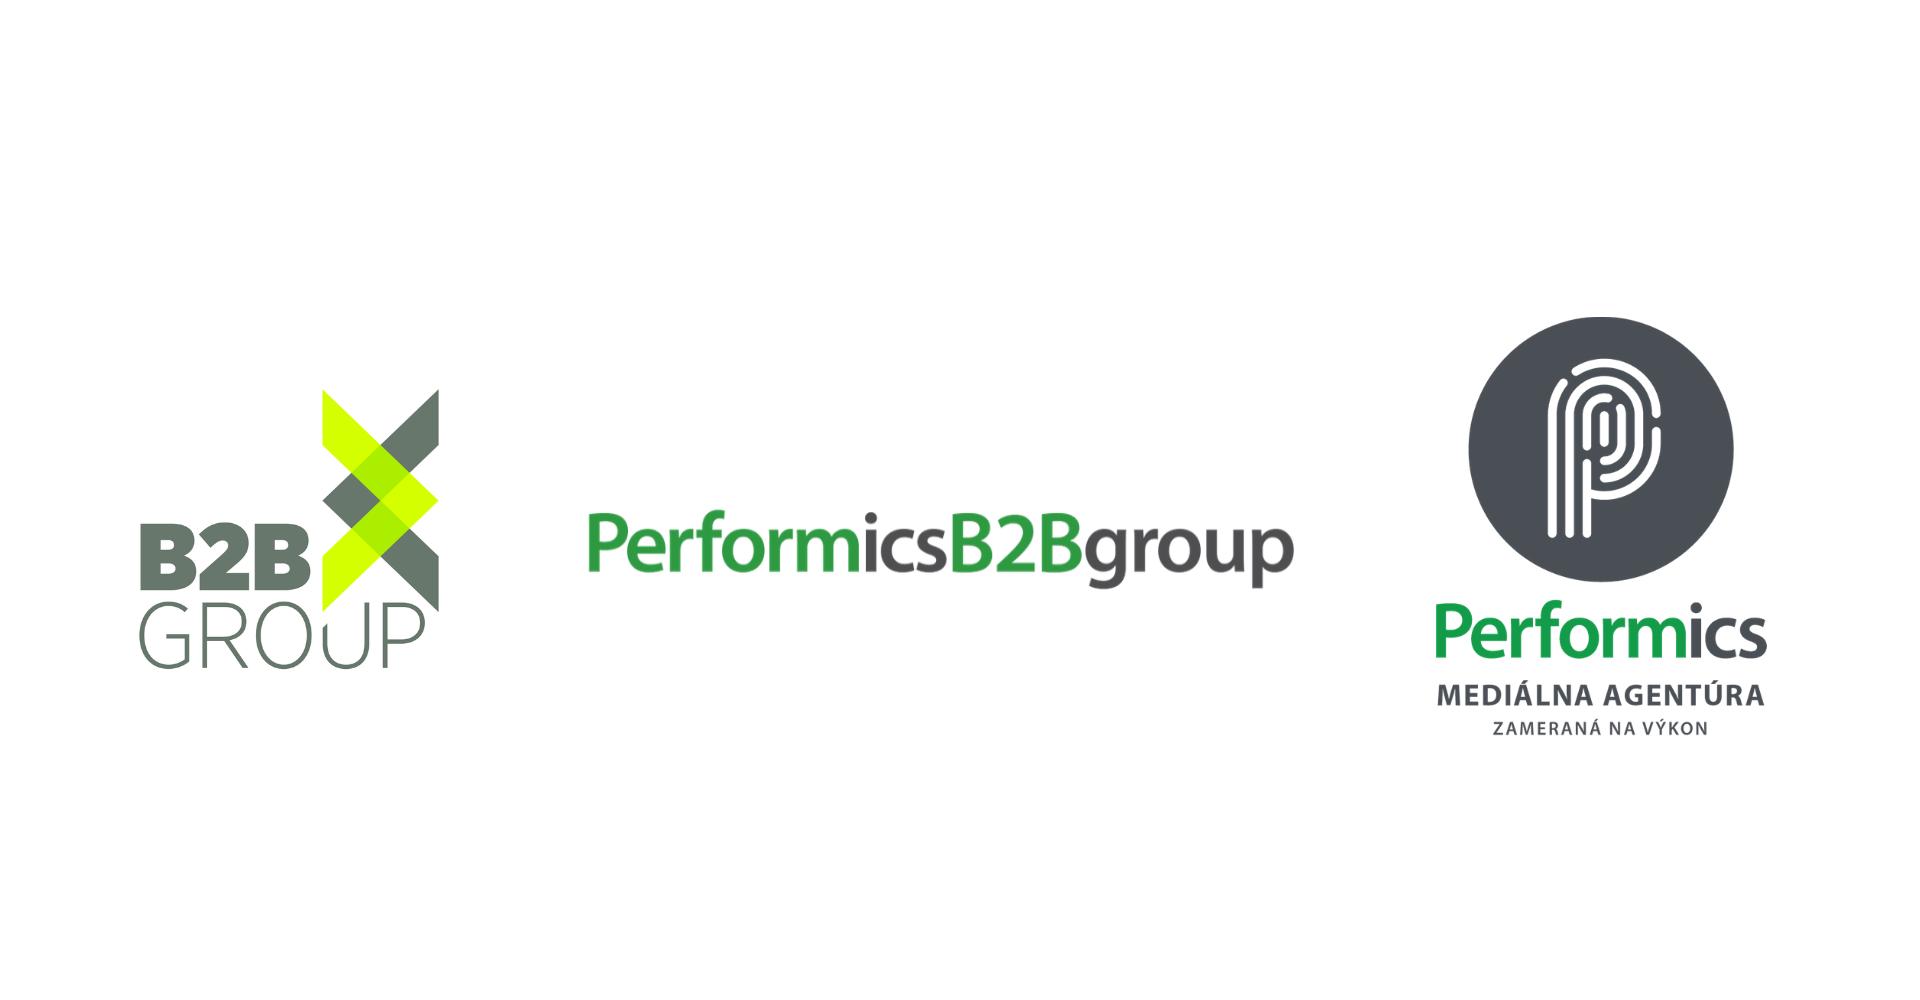 performics-vyvoj-loga